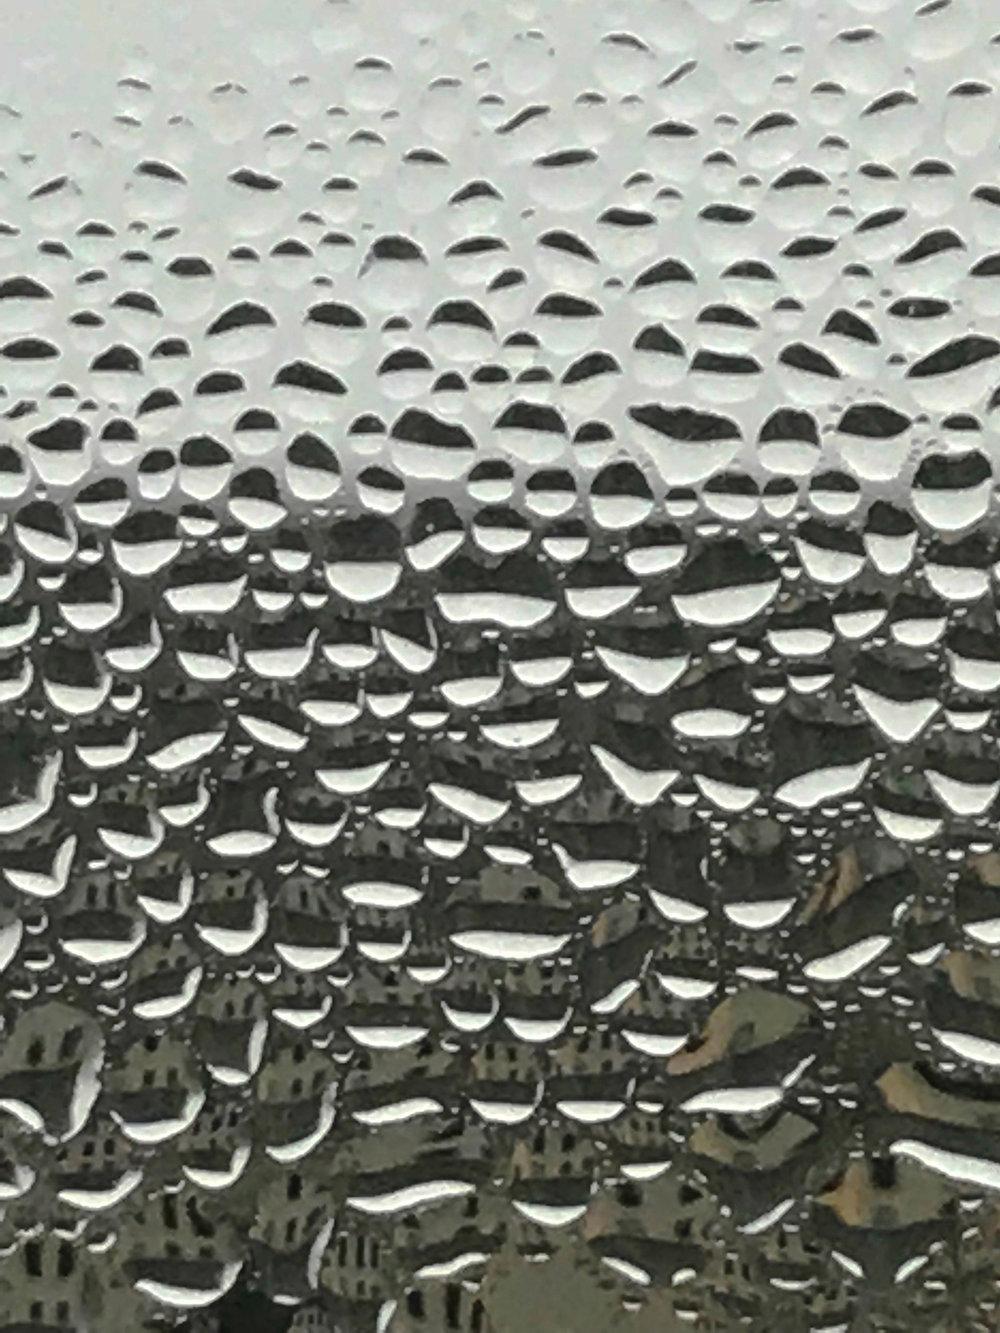 Droplets - The visual magic of water drops.